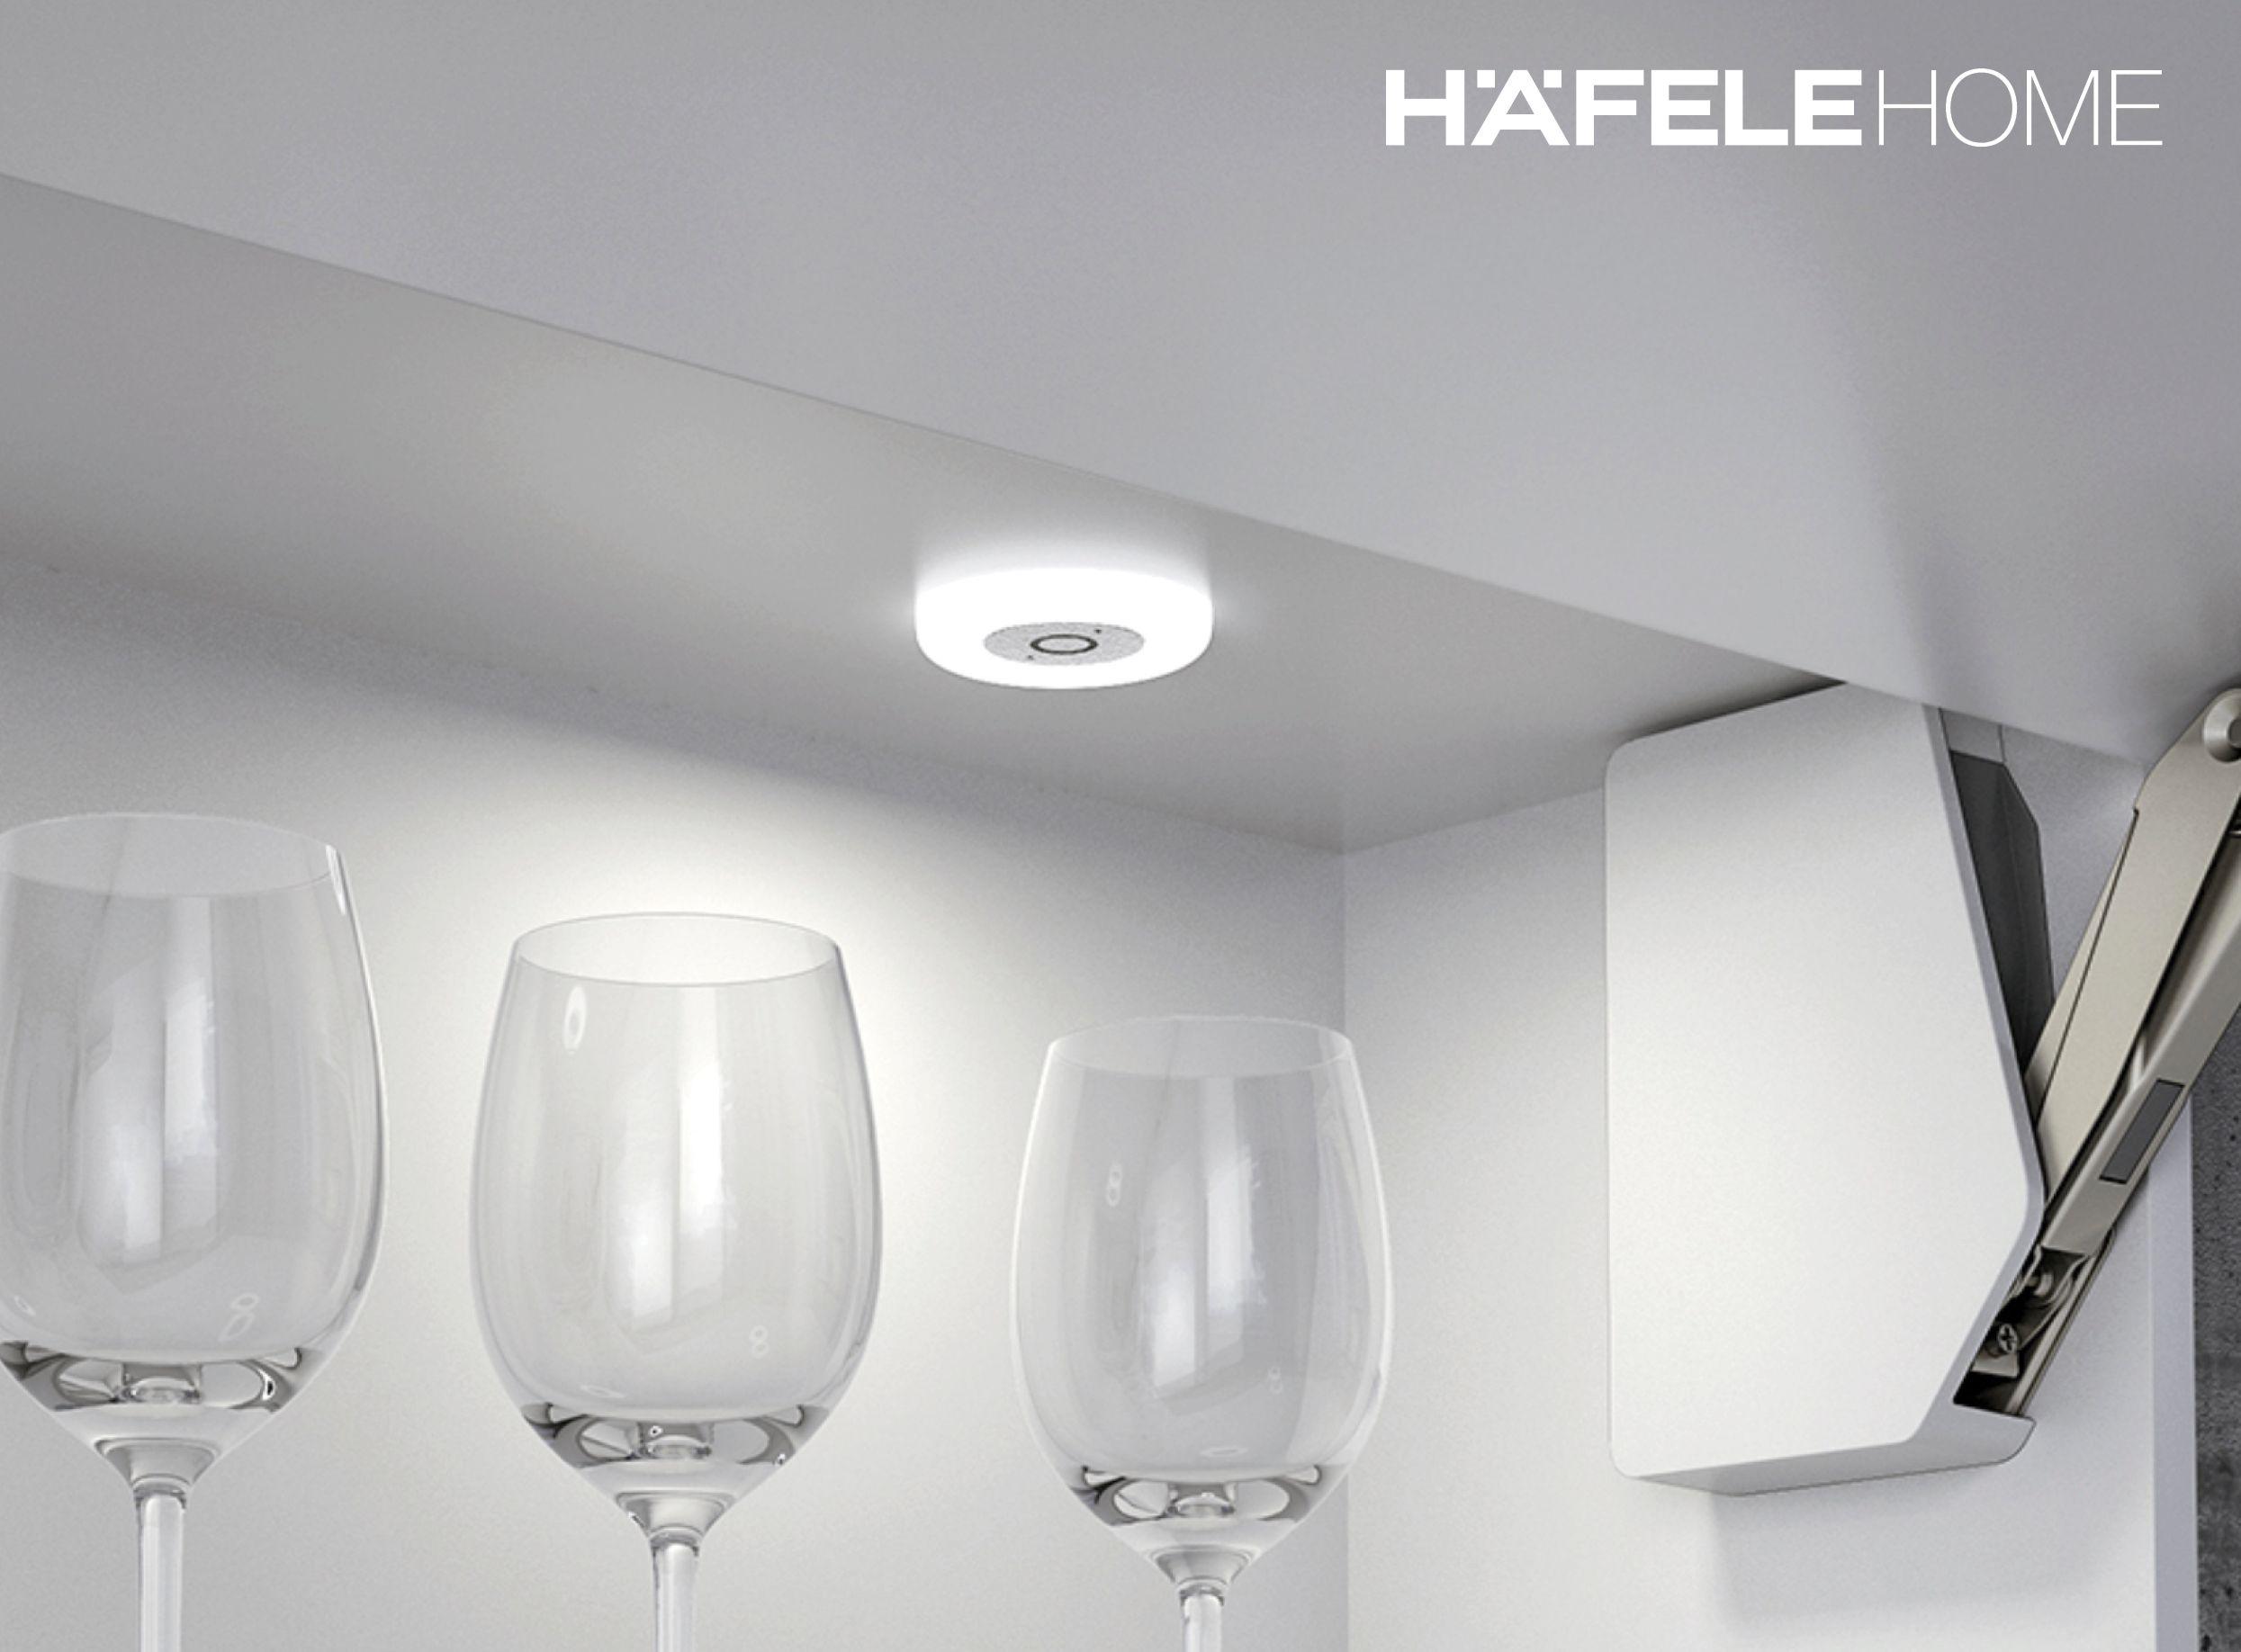 Loox 2040 Led Downlight In 2020 Downlights Hafele Lighting Solutions